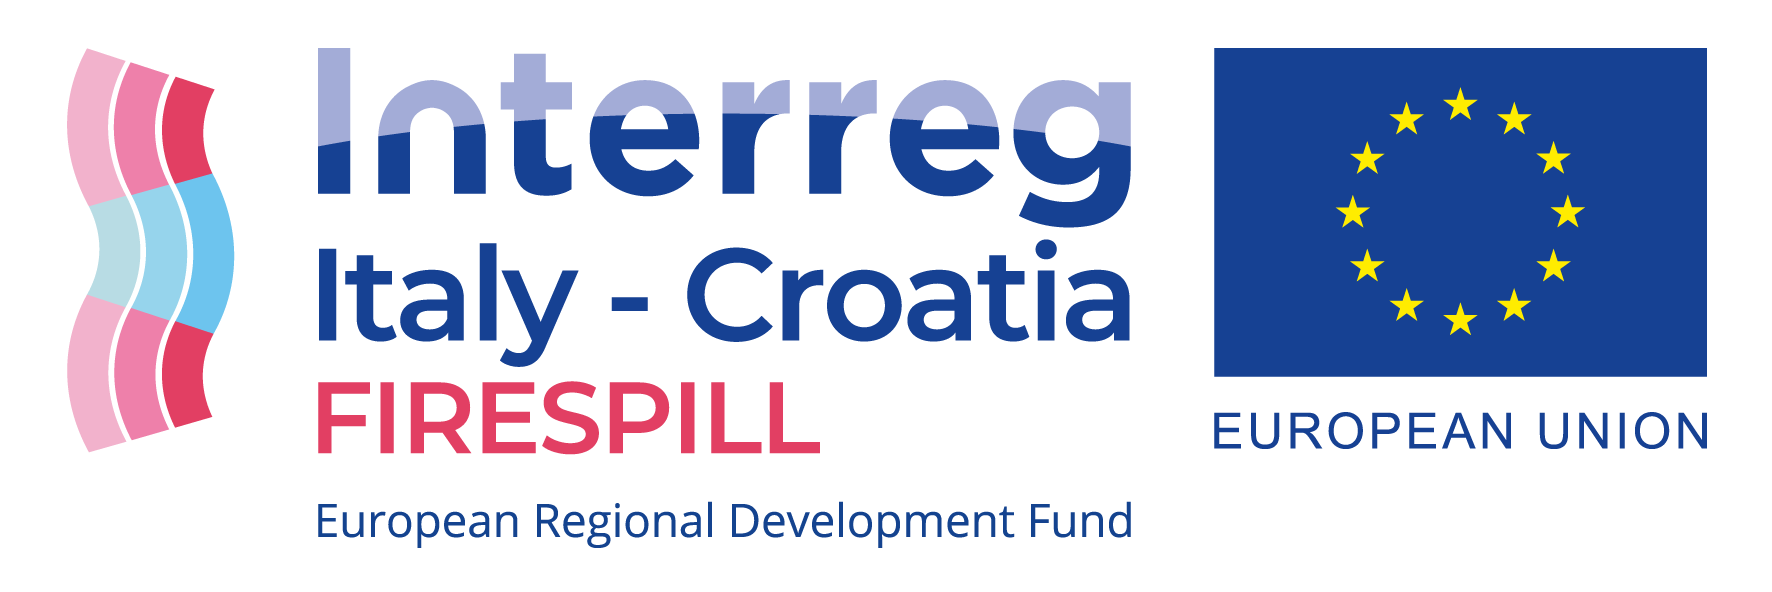 FIRESPILL - Italia-Croatia